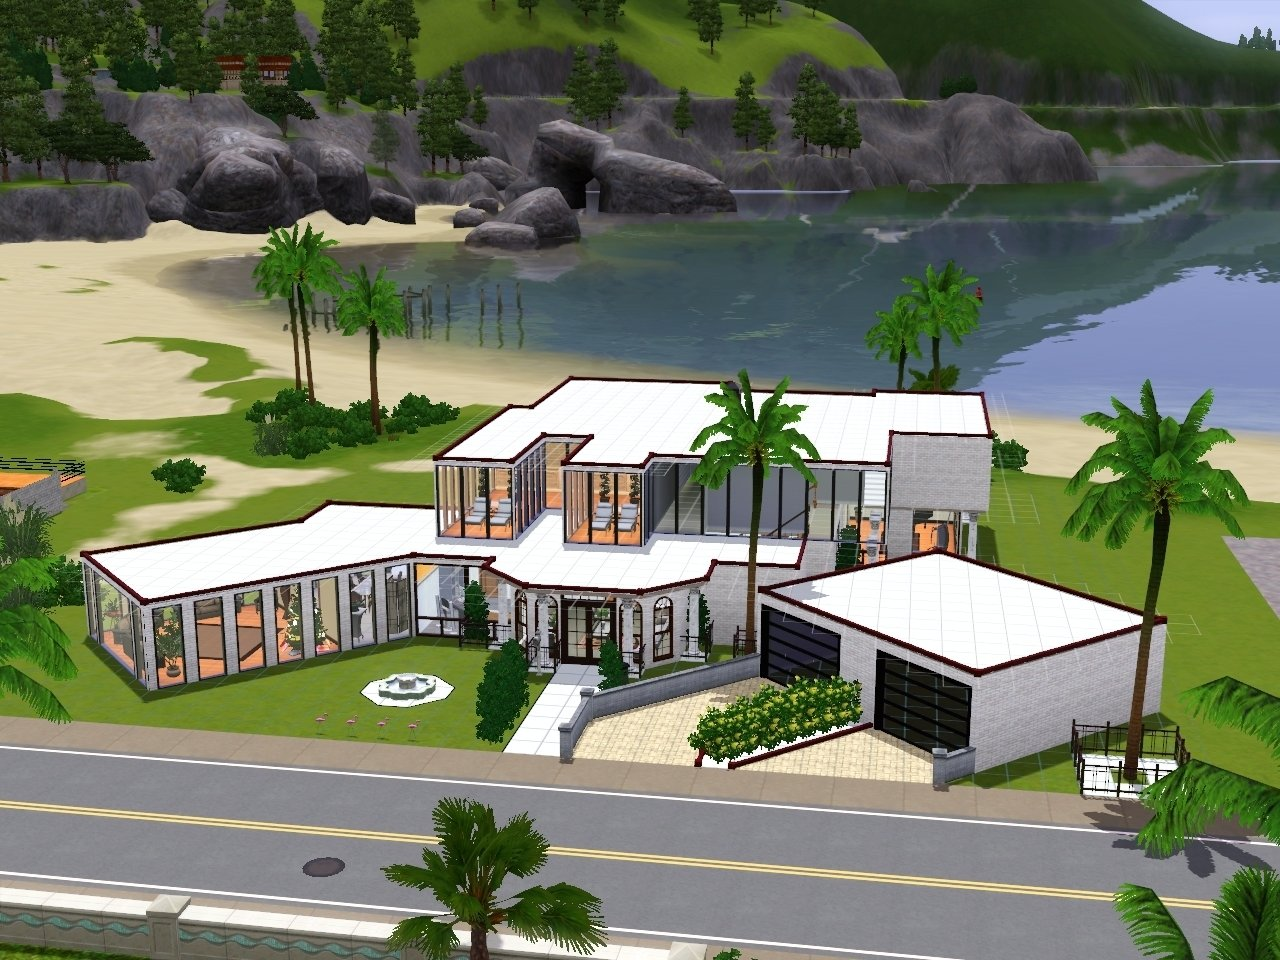 10 Stylish House Ideas For Sims 3 sims house ideas designs xbox modern home design house plans 61966 1 2021